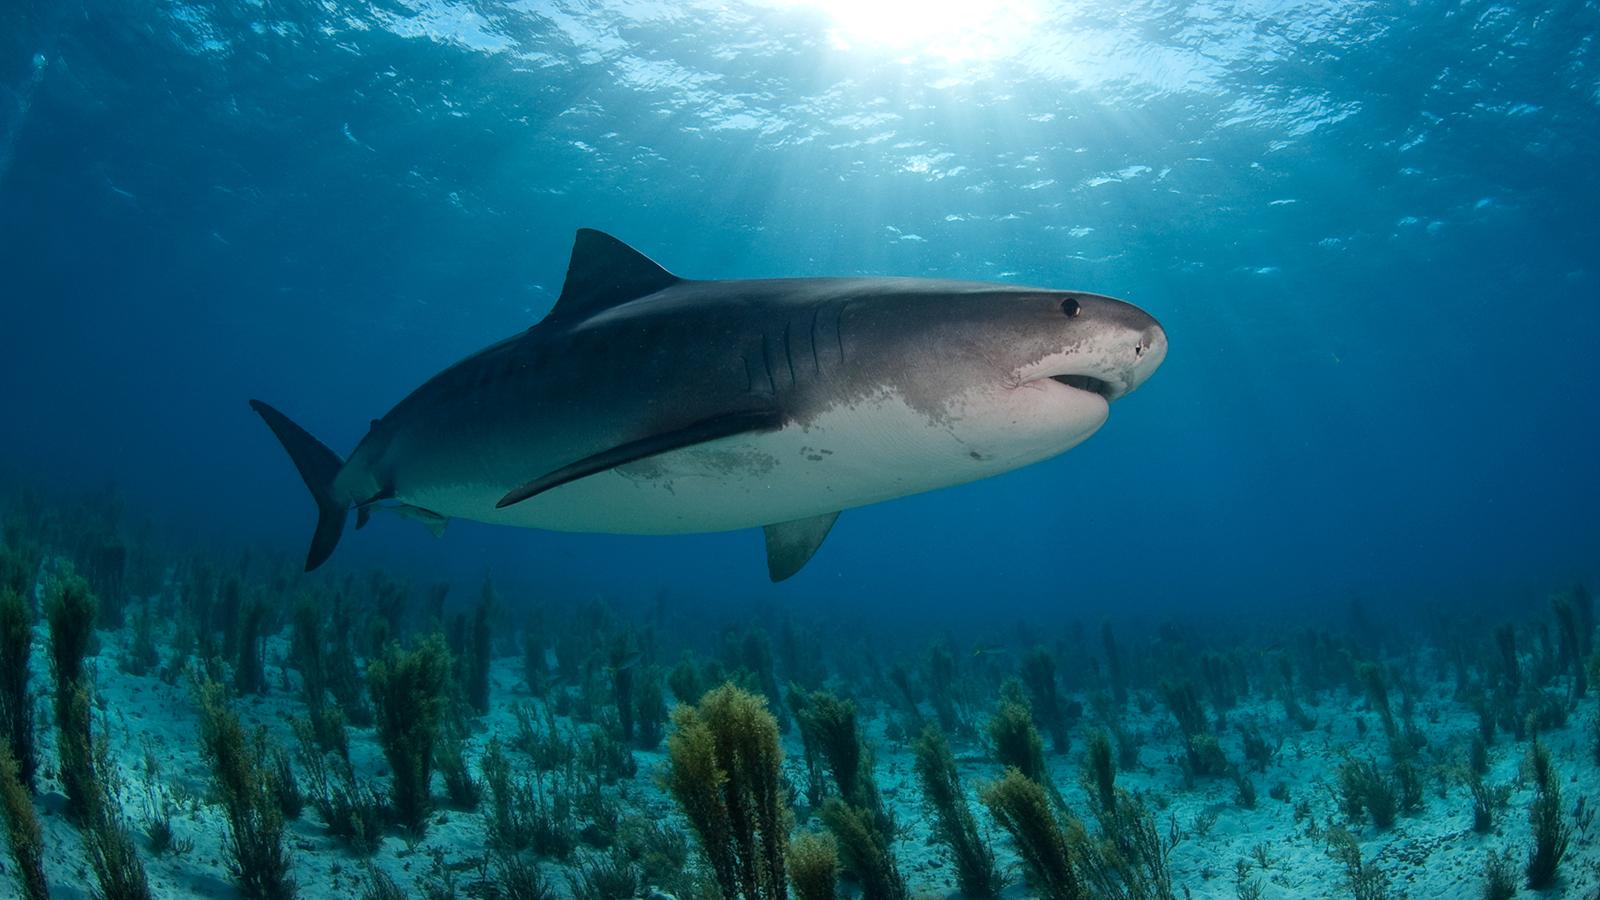 tiger shark 1280x800 - photo #3